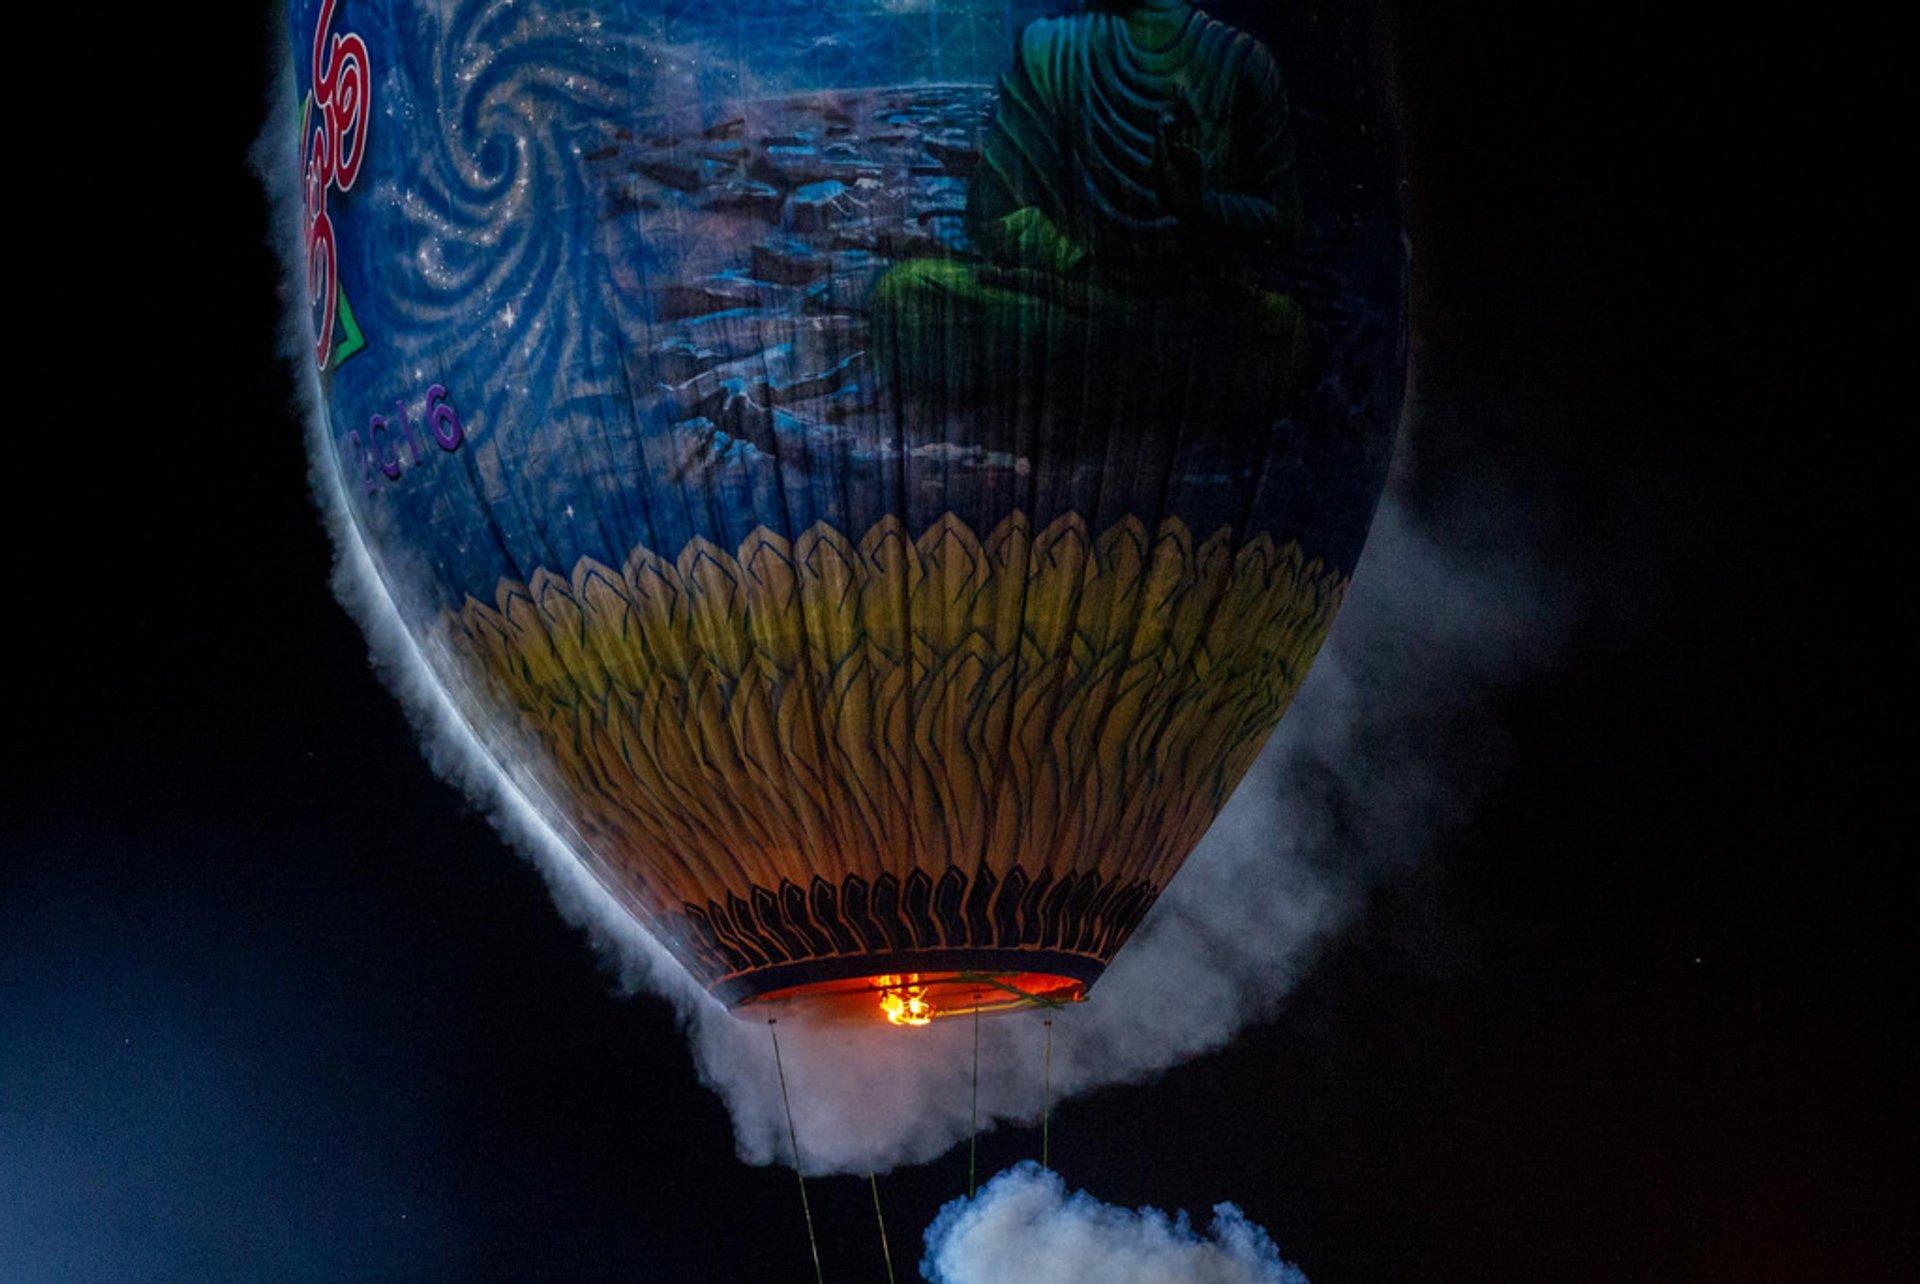 Balloon Festival in Taunggyi in Myanmar - Best Season 2020